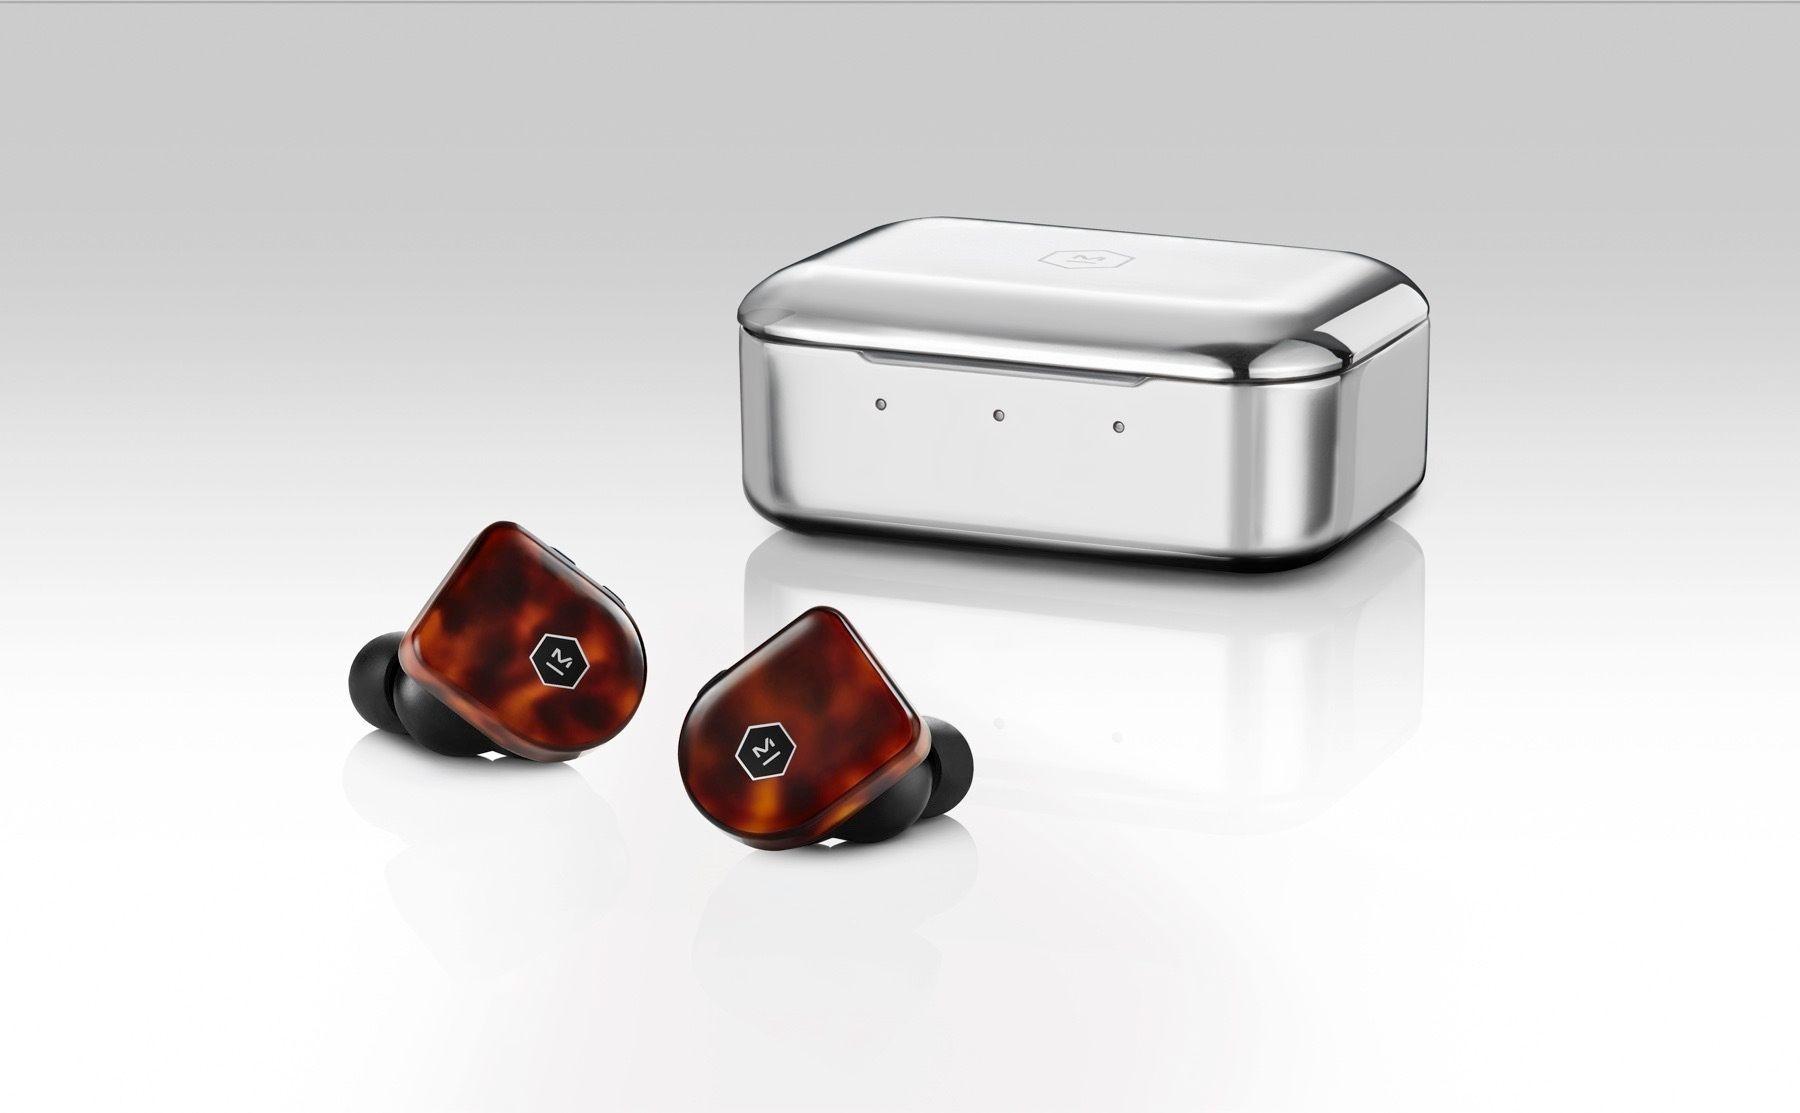 Proppene kan lades tre ganger i etuiet før det går tom for batteri. Det ekstremt ripeutsatte ståletuiet lever tilsynelatende videre.